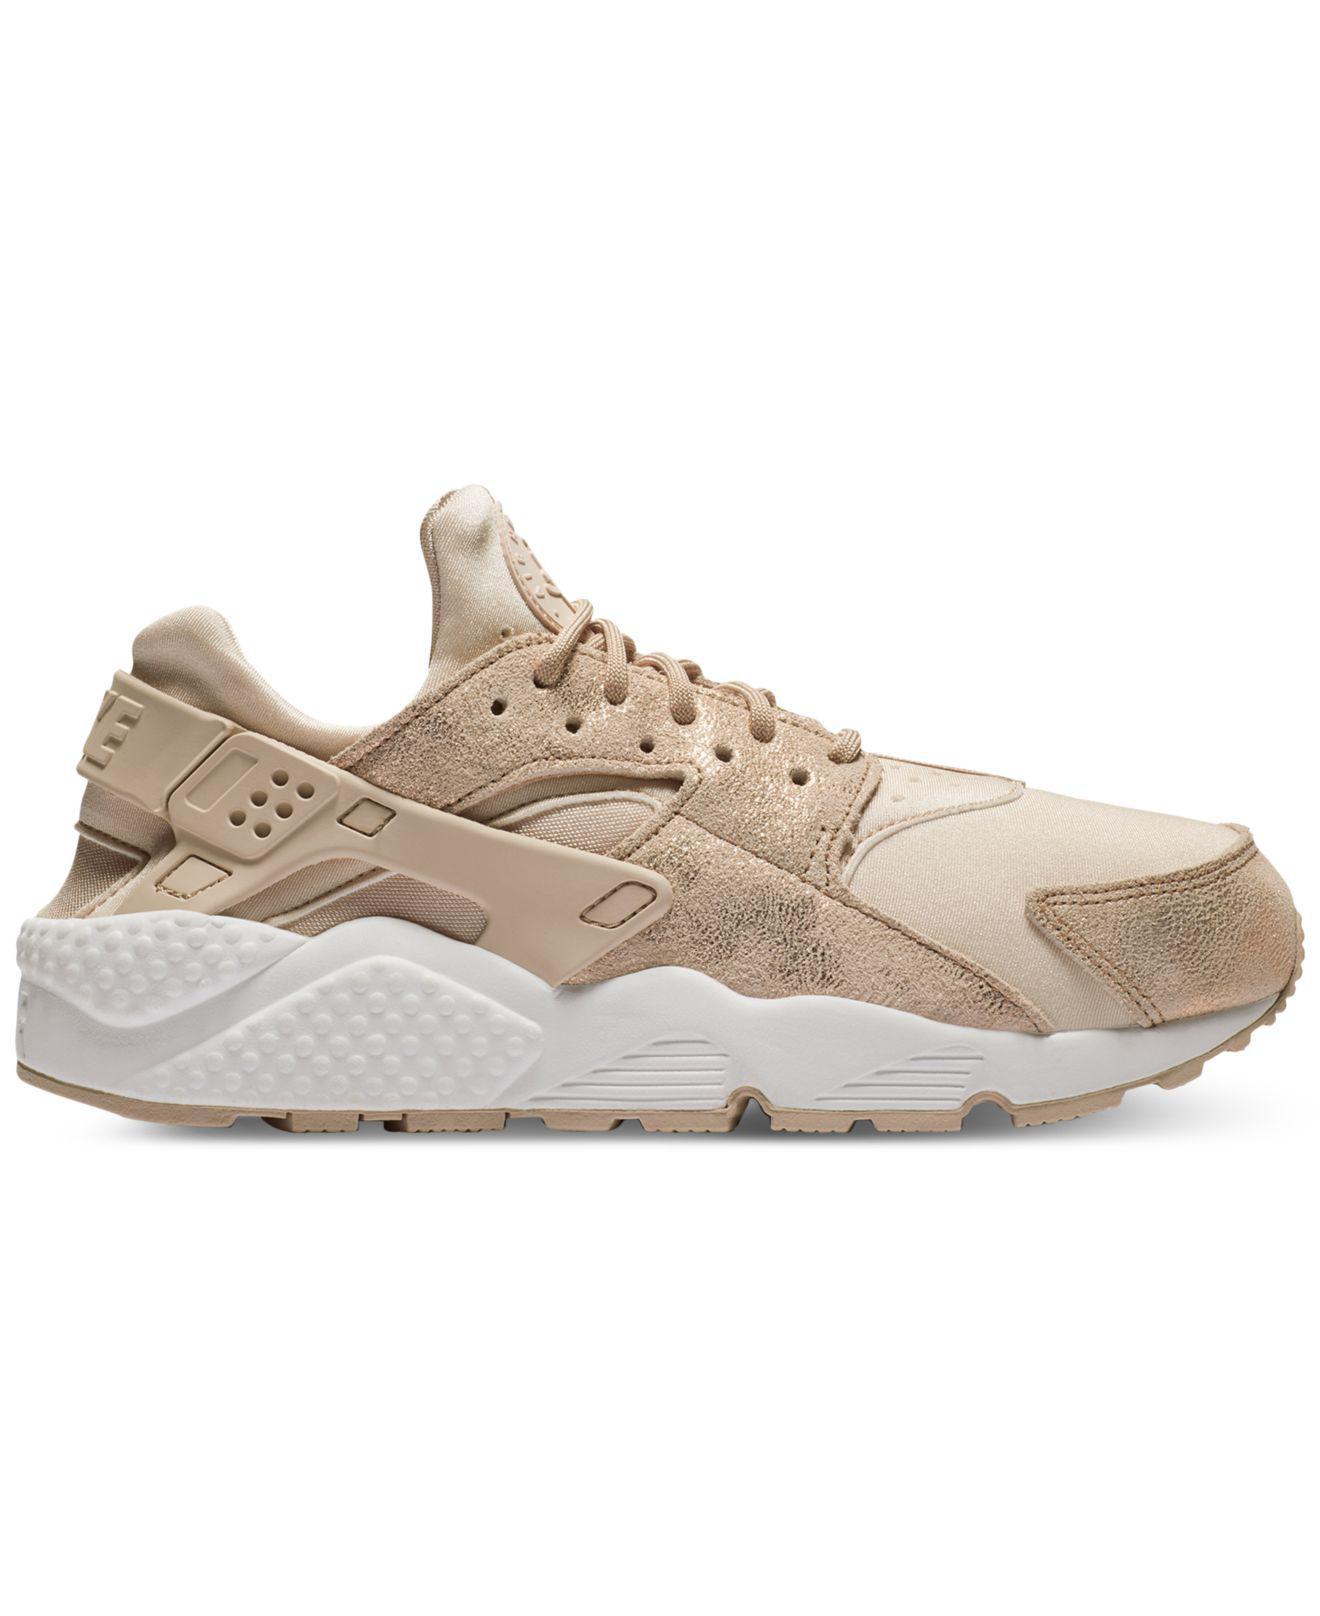 outlet store 9bd3e 124dc Nike. Women s Natural Air Huarache Run Bl Running Sneakers ...